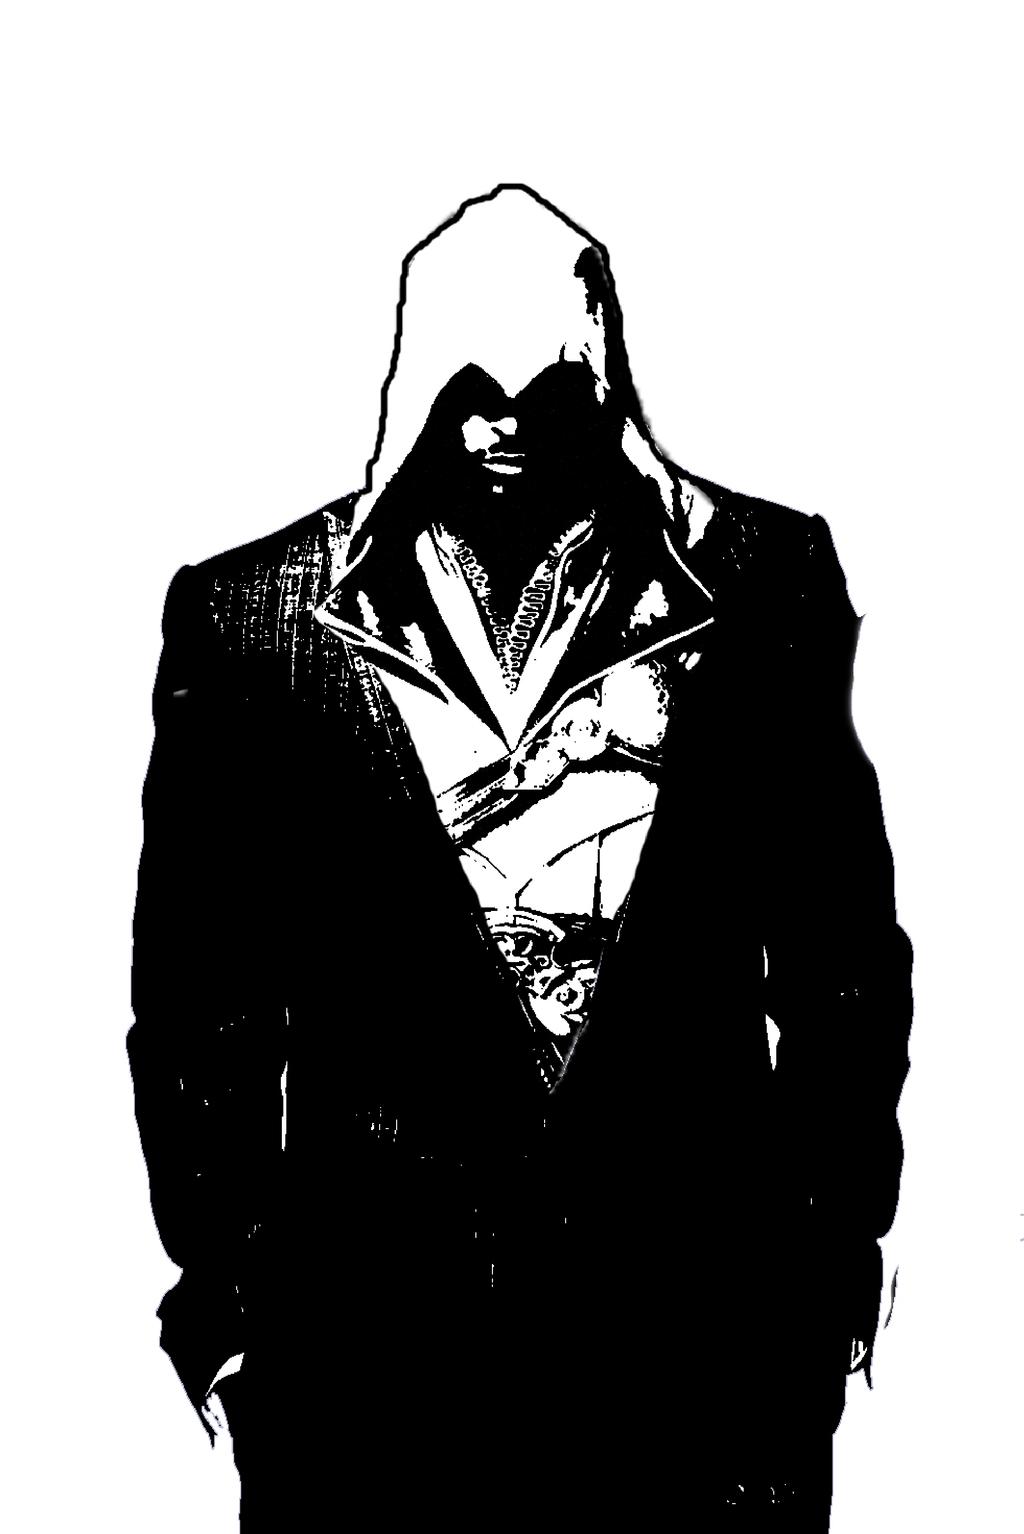 Modern Assassin by ou7lander on DeviantArt